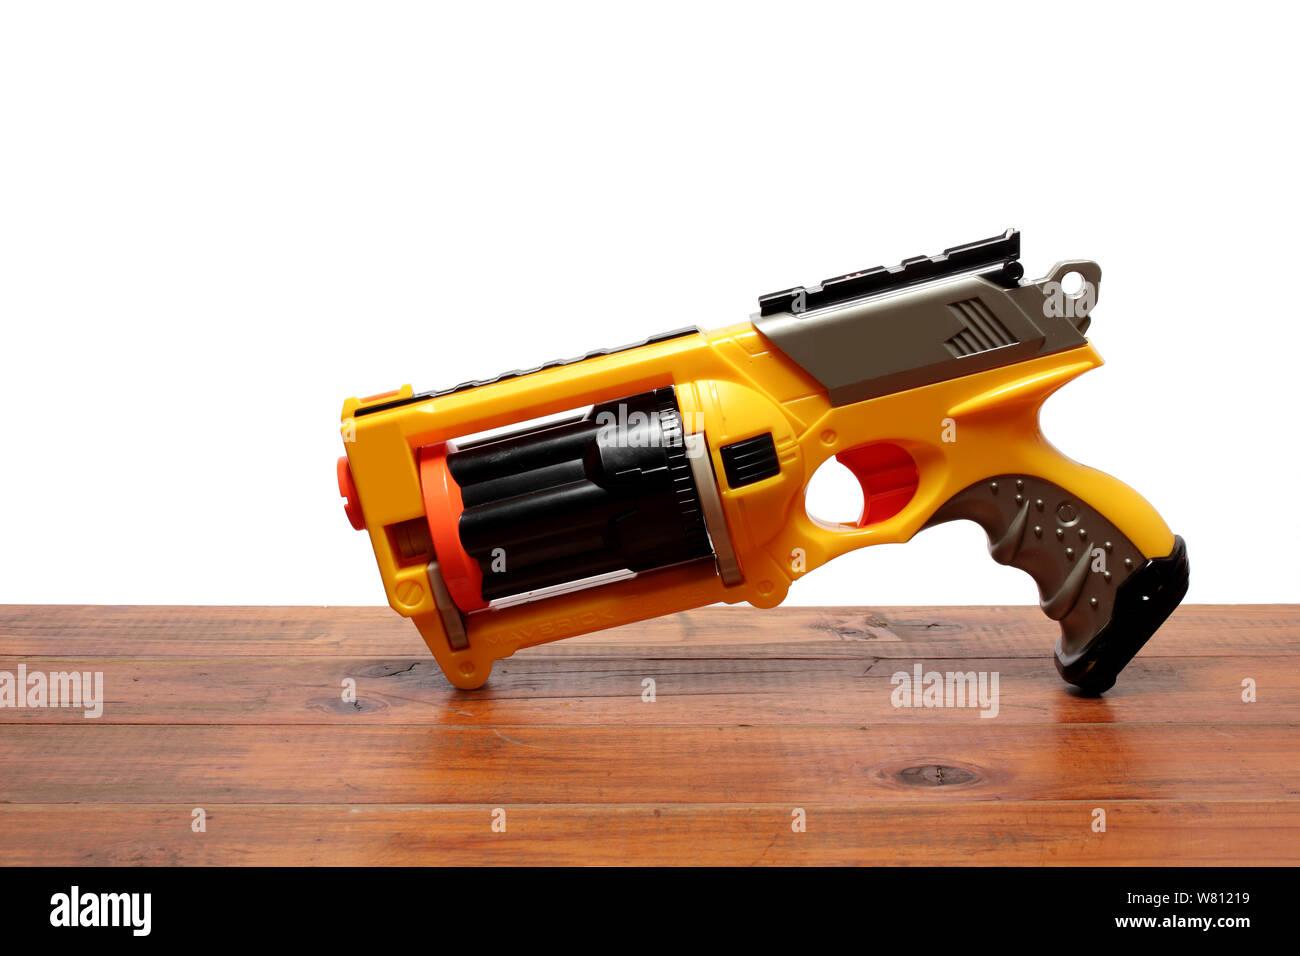 Wooden Gun Toy Slingshot Handcrafted Pretend outdoor play kid boy Cowboy Vintage